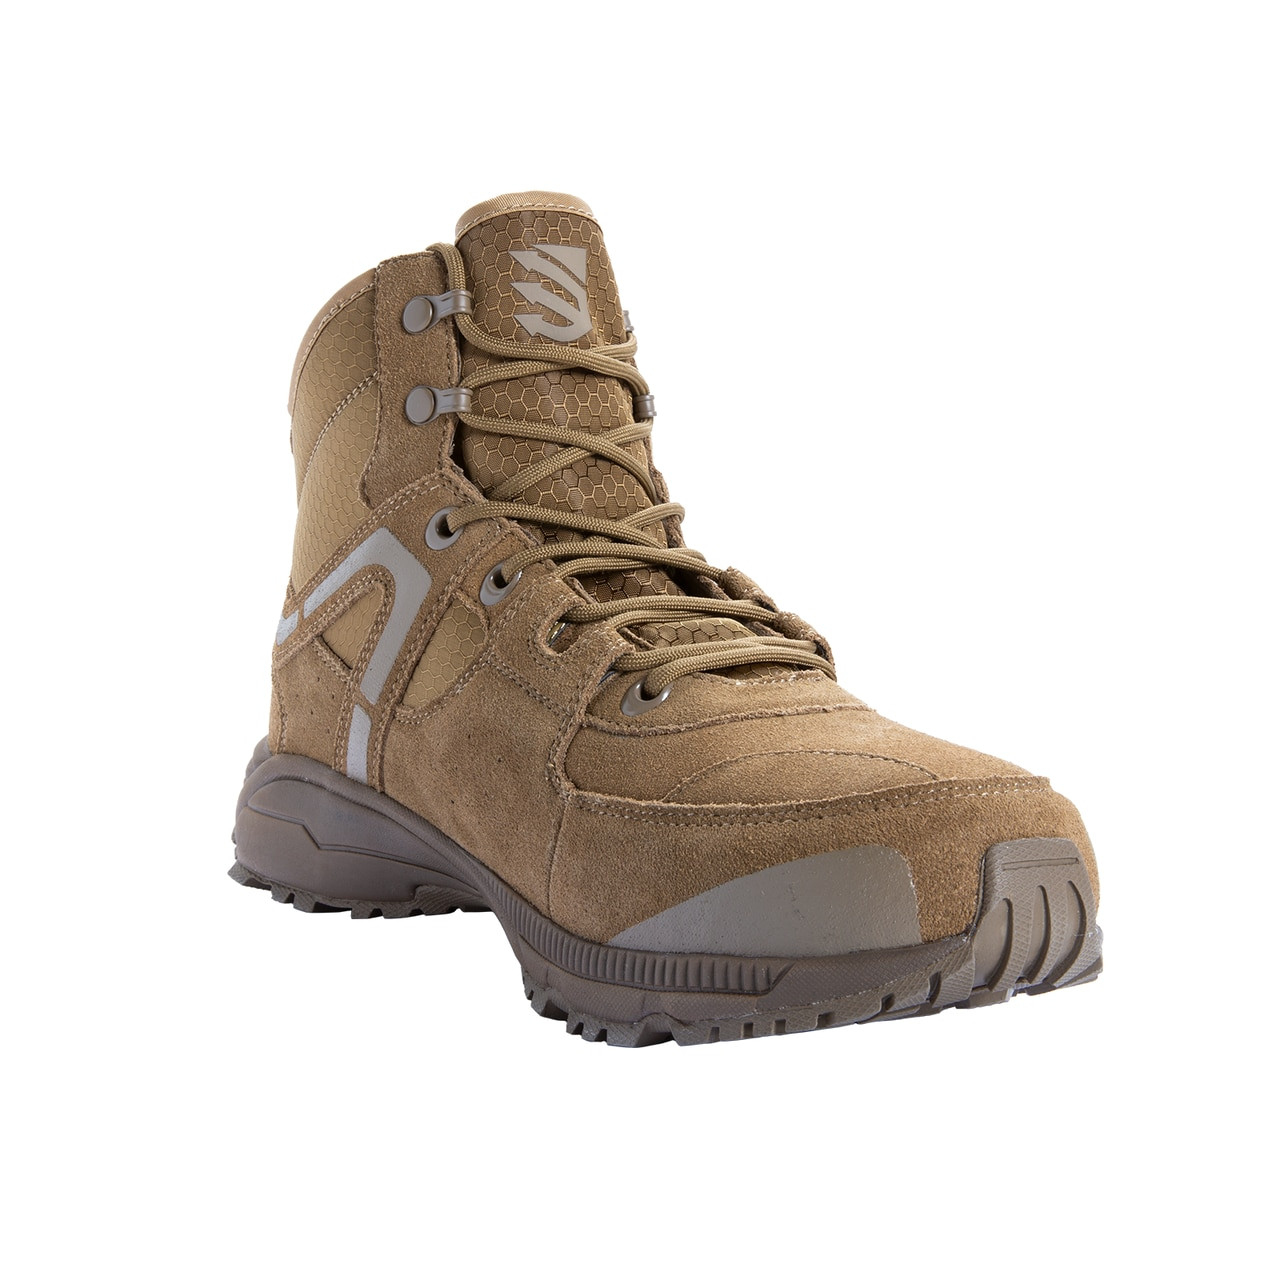 BT06CY090M 6 Trident Ultralite Boot Coyote 498 9//Medium 18481 BLACKHAWK